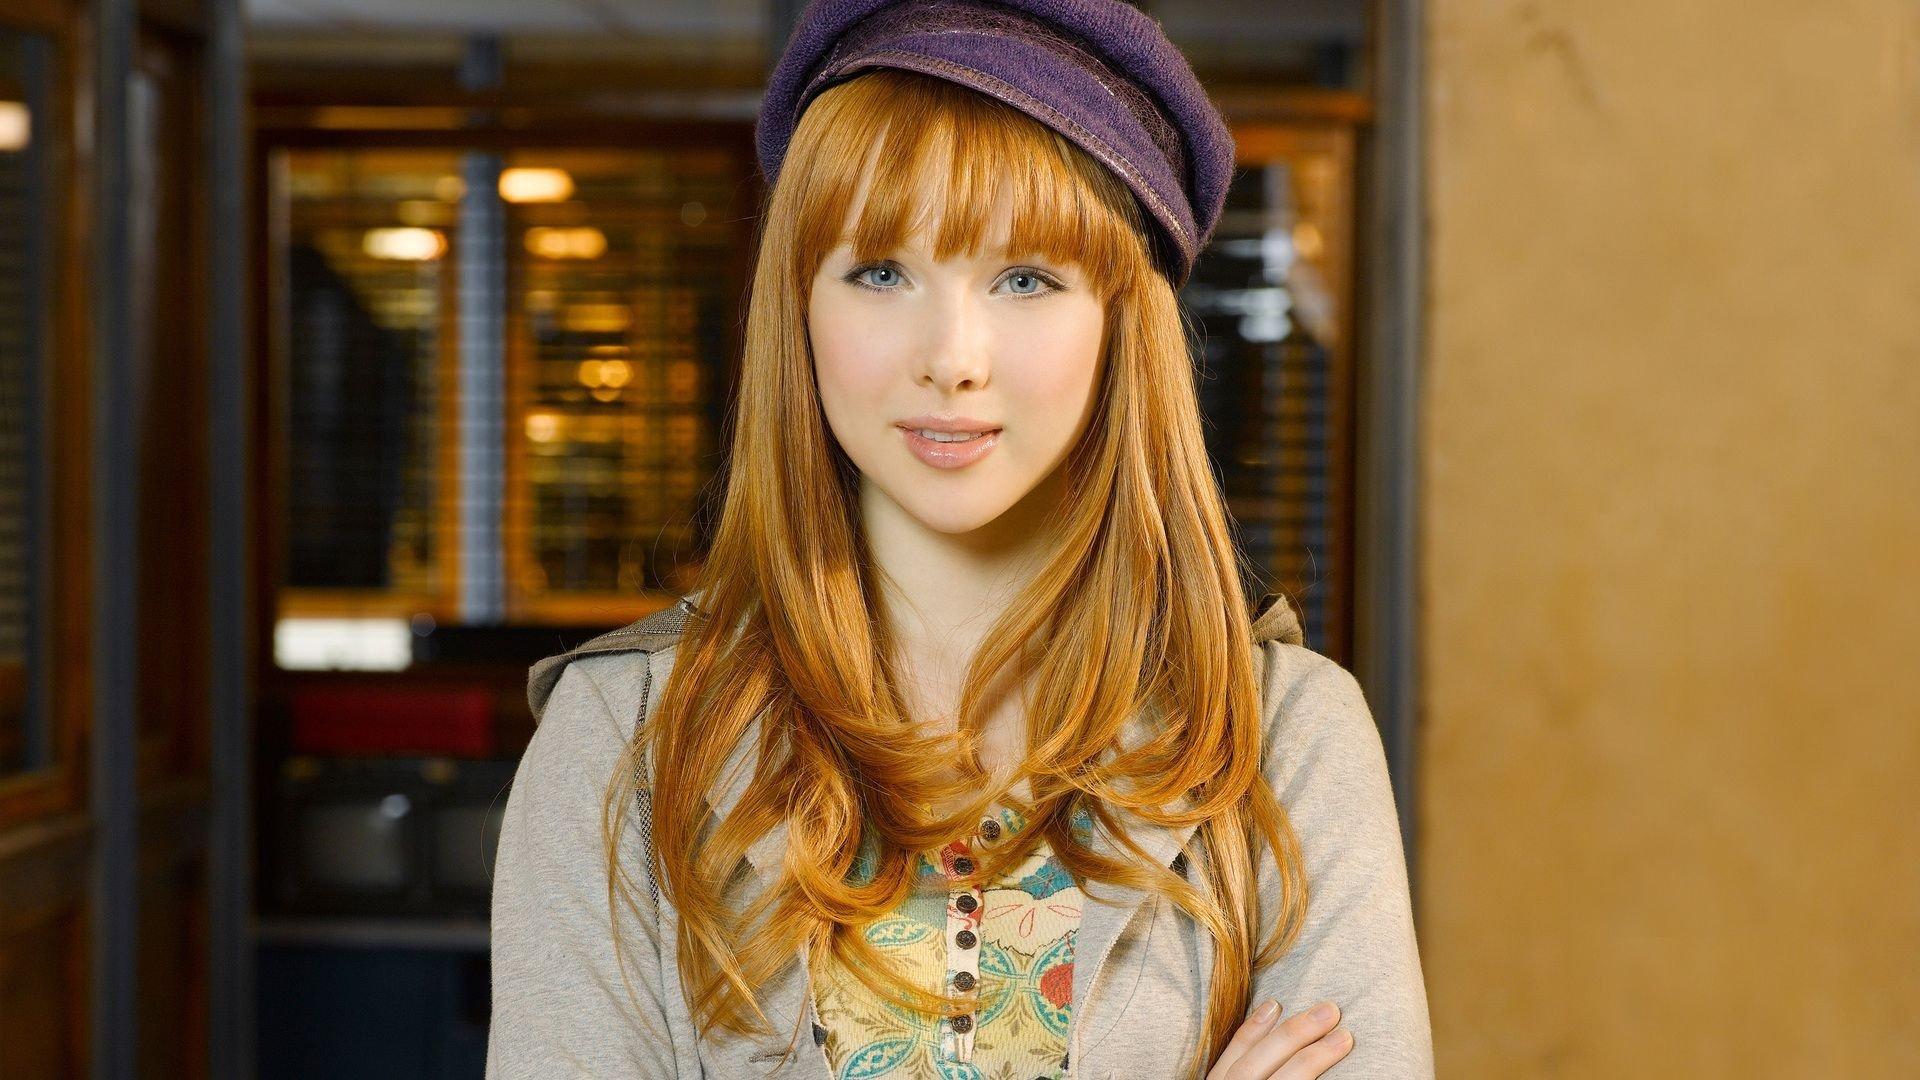 model, Redhead, Anime, Actress, Women, Face, Portrait, Smiling, Long hair, Blue eyes, Castle (TV series), Molly Quinn Wallpaper